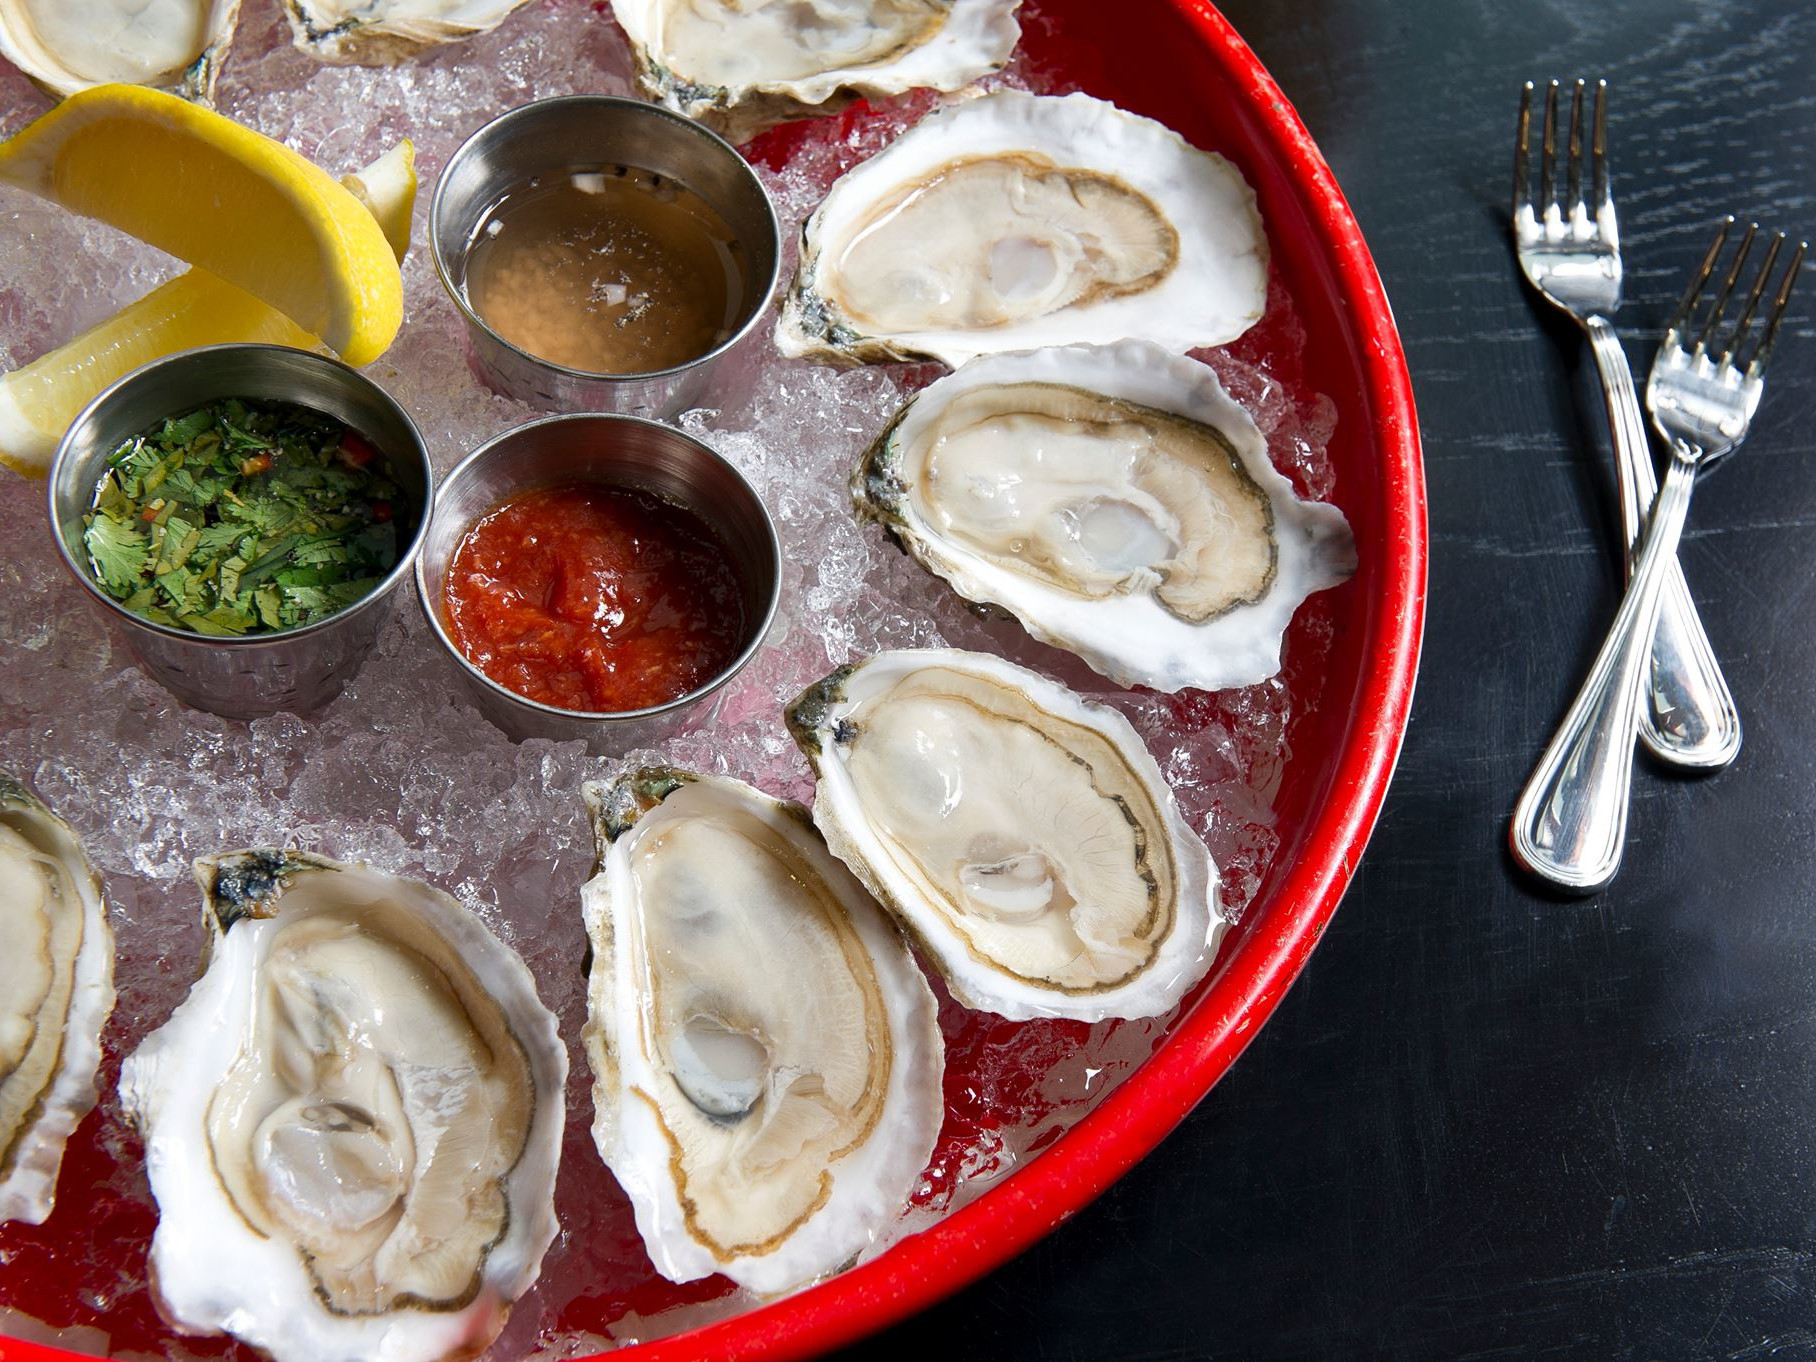 12 best oyster bars in Boston